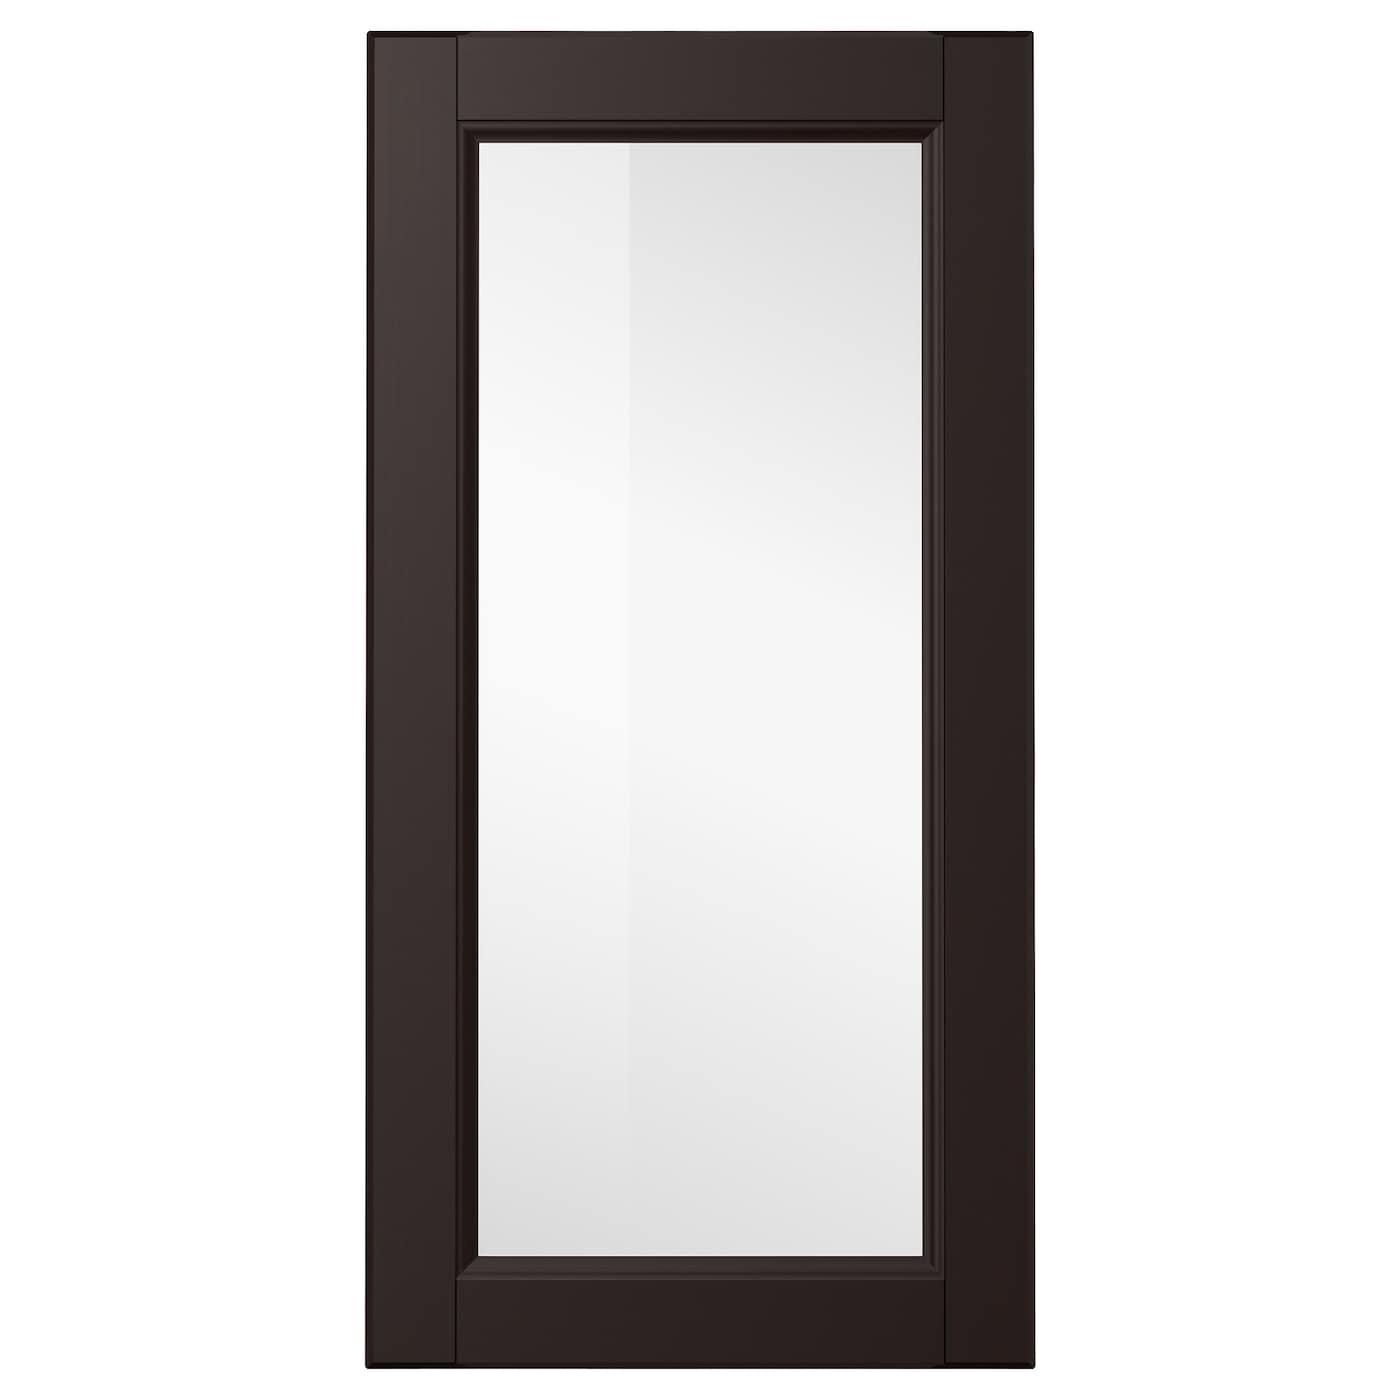 laxarby porte vitr e brun noir 40x80 cm ikea. Black Bedroom Furniture Sets. Home Design Ideas